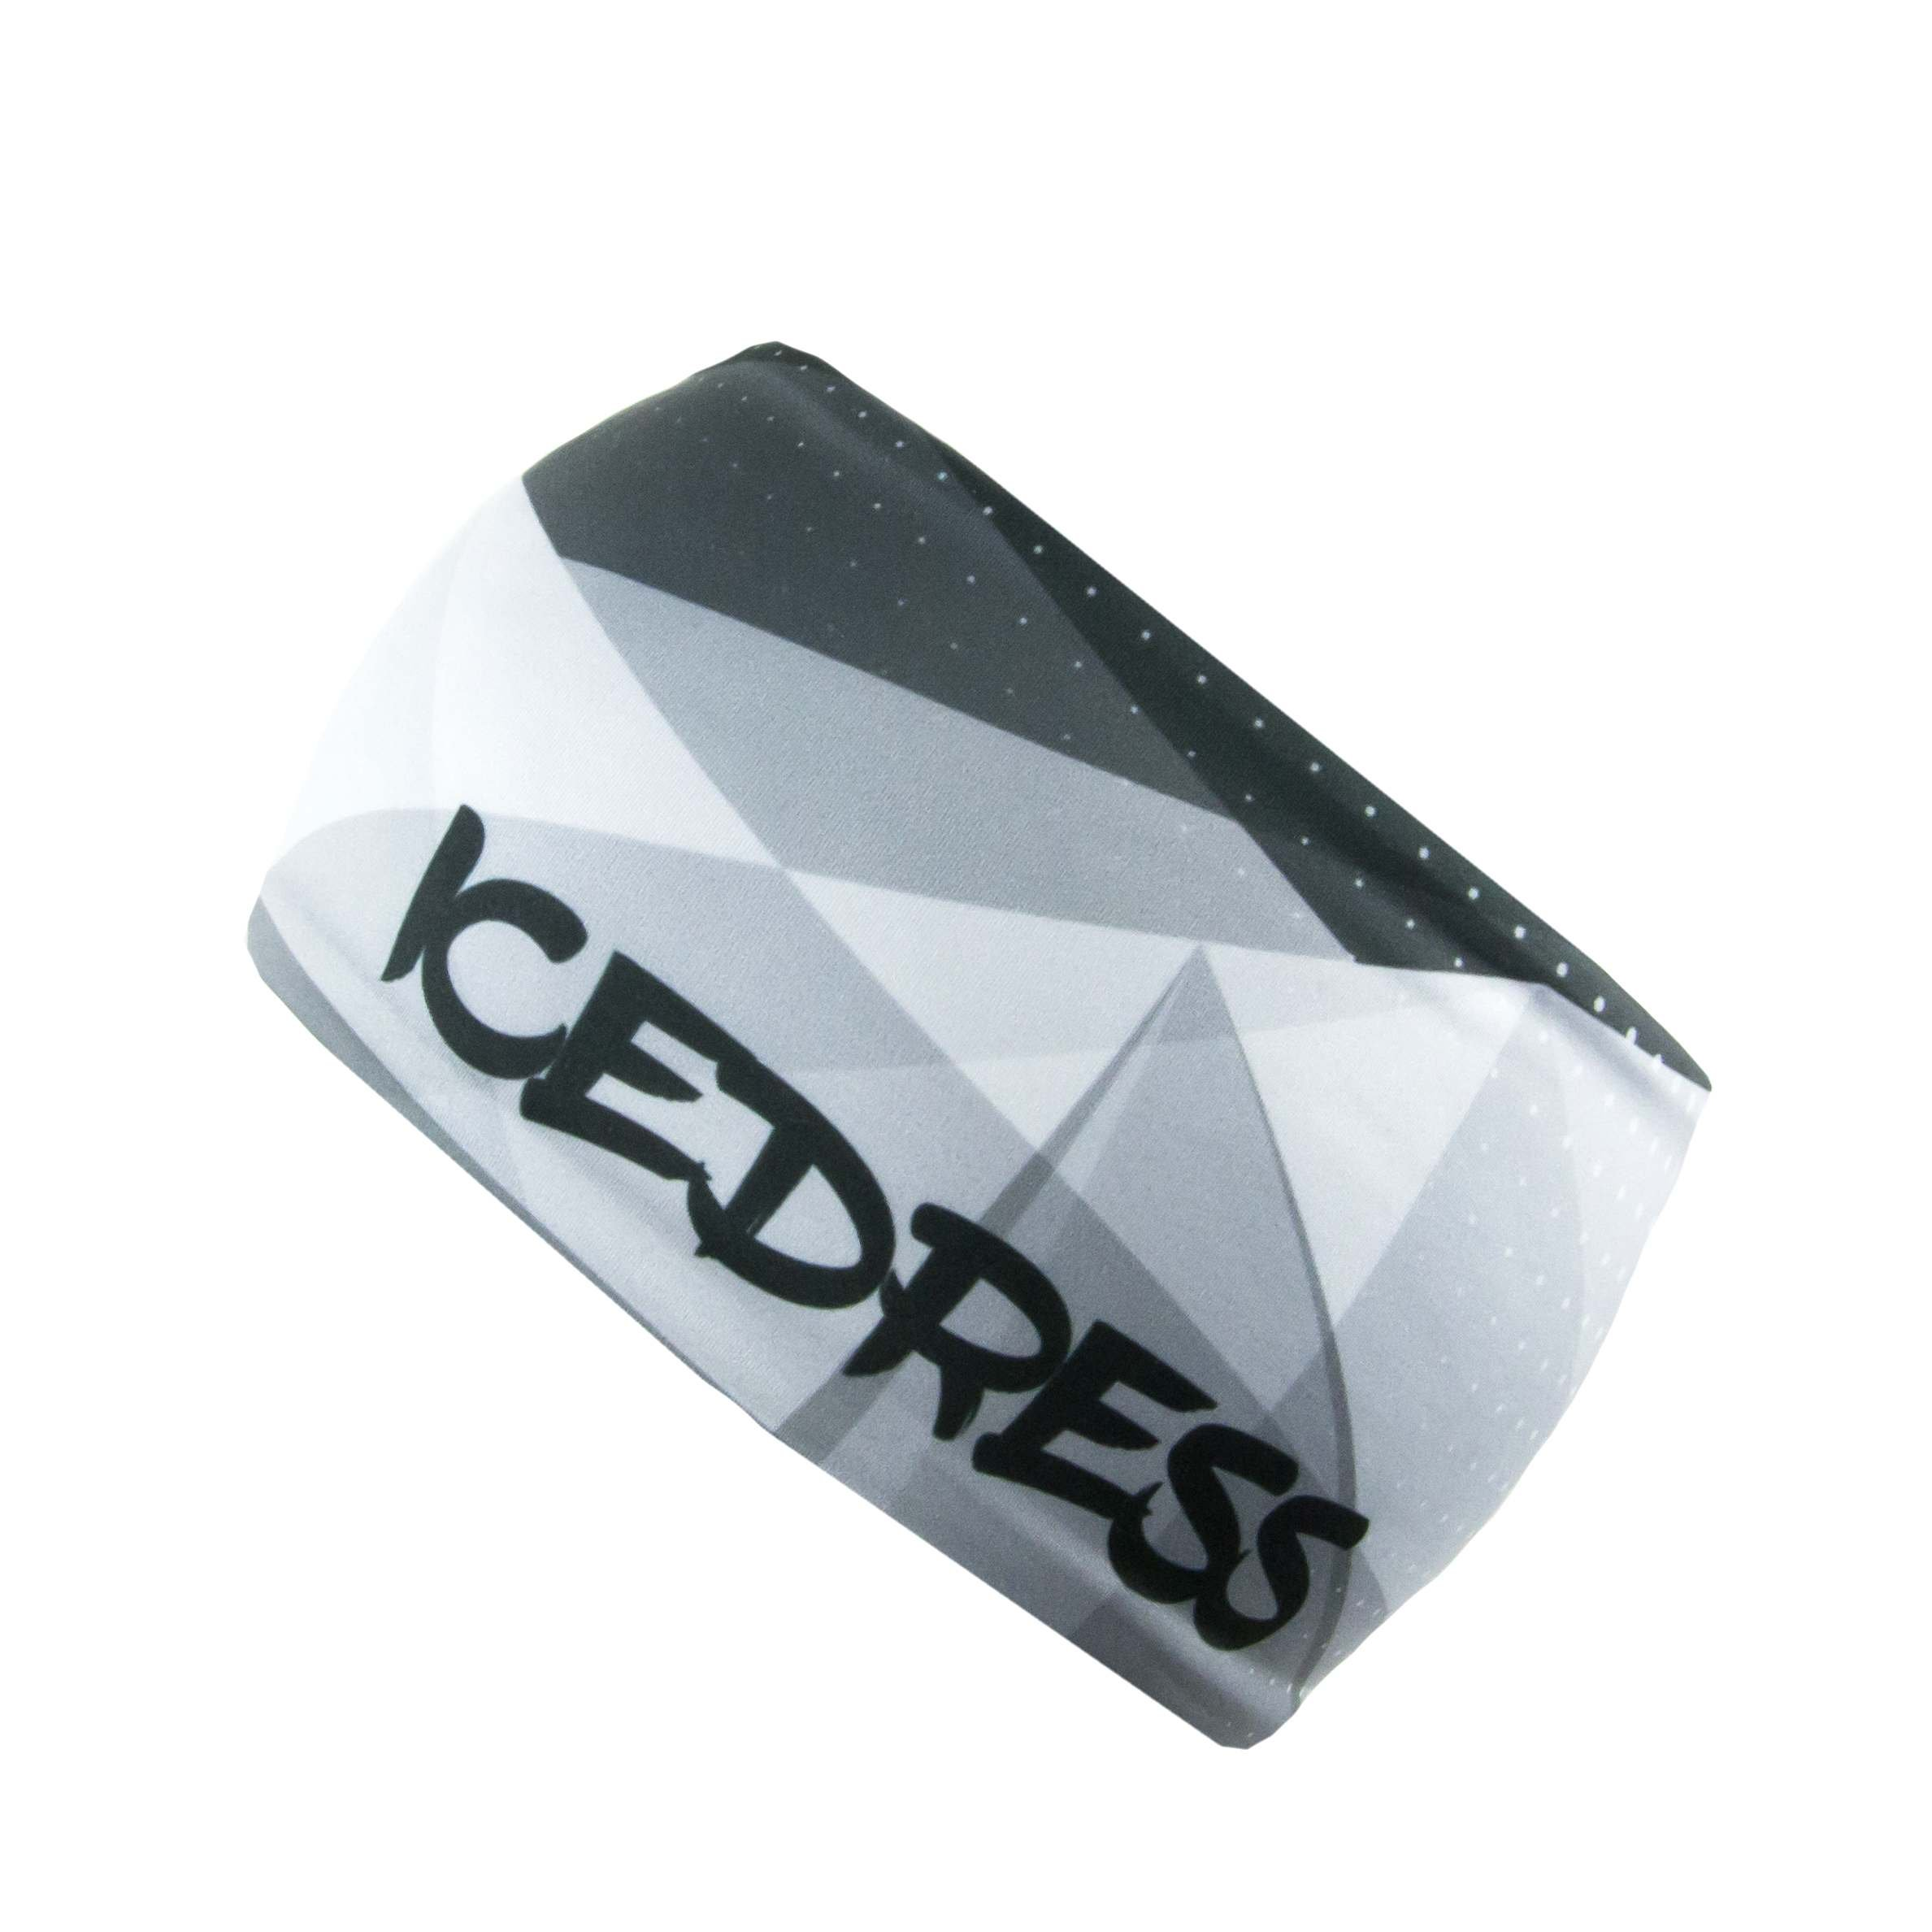 bb83561a2b3 IceDress sportovní čelenka TRIANGL V